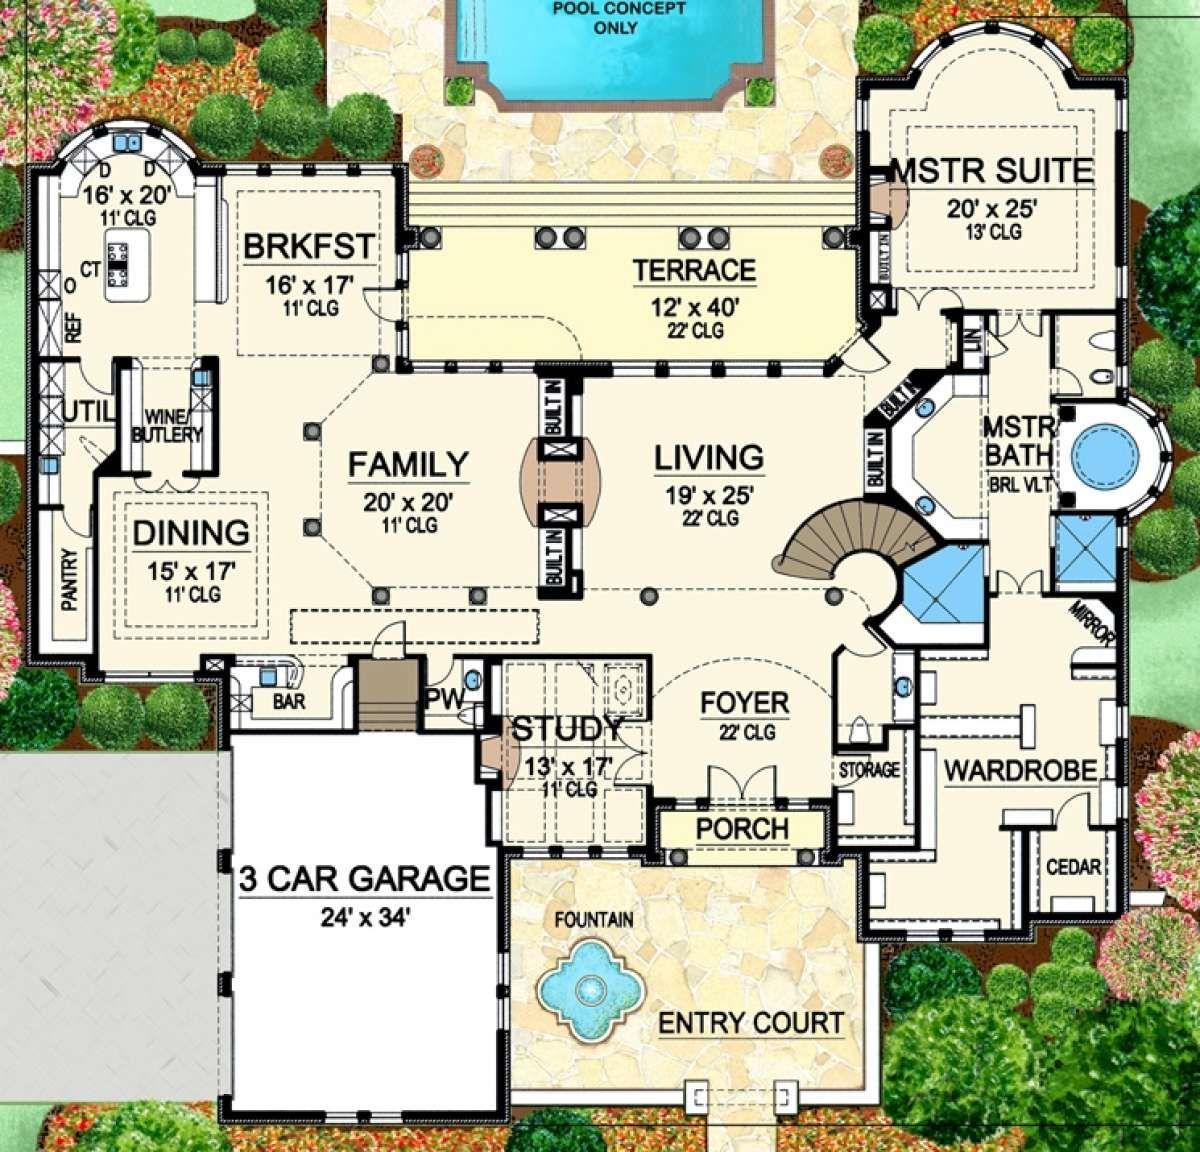 House Plan 5445 00200 Luxury Plan 6 903 Square Feet 4 Bedrooms 5 Bathrooms In 2020 Luxury Plan Tuscan House Plans House Plans